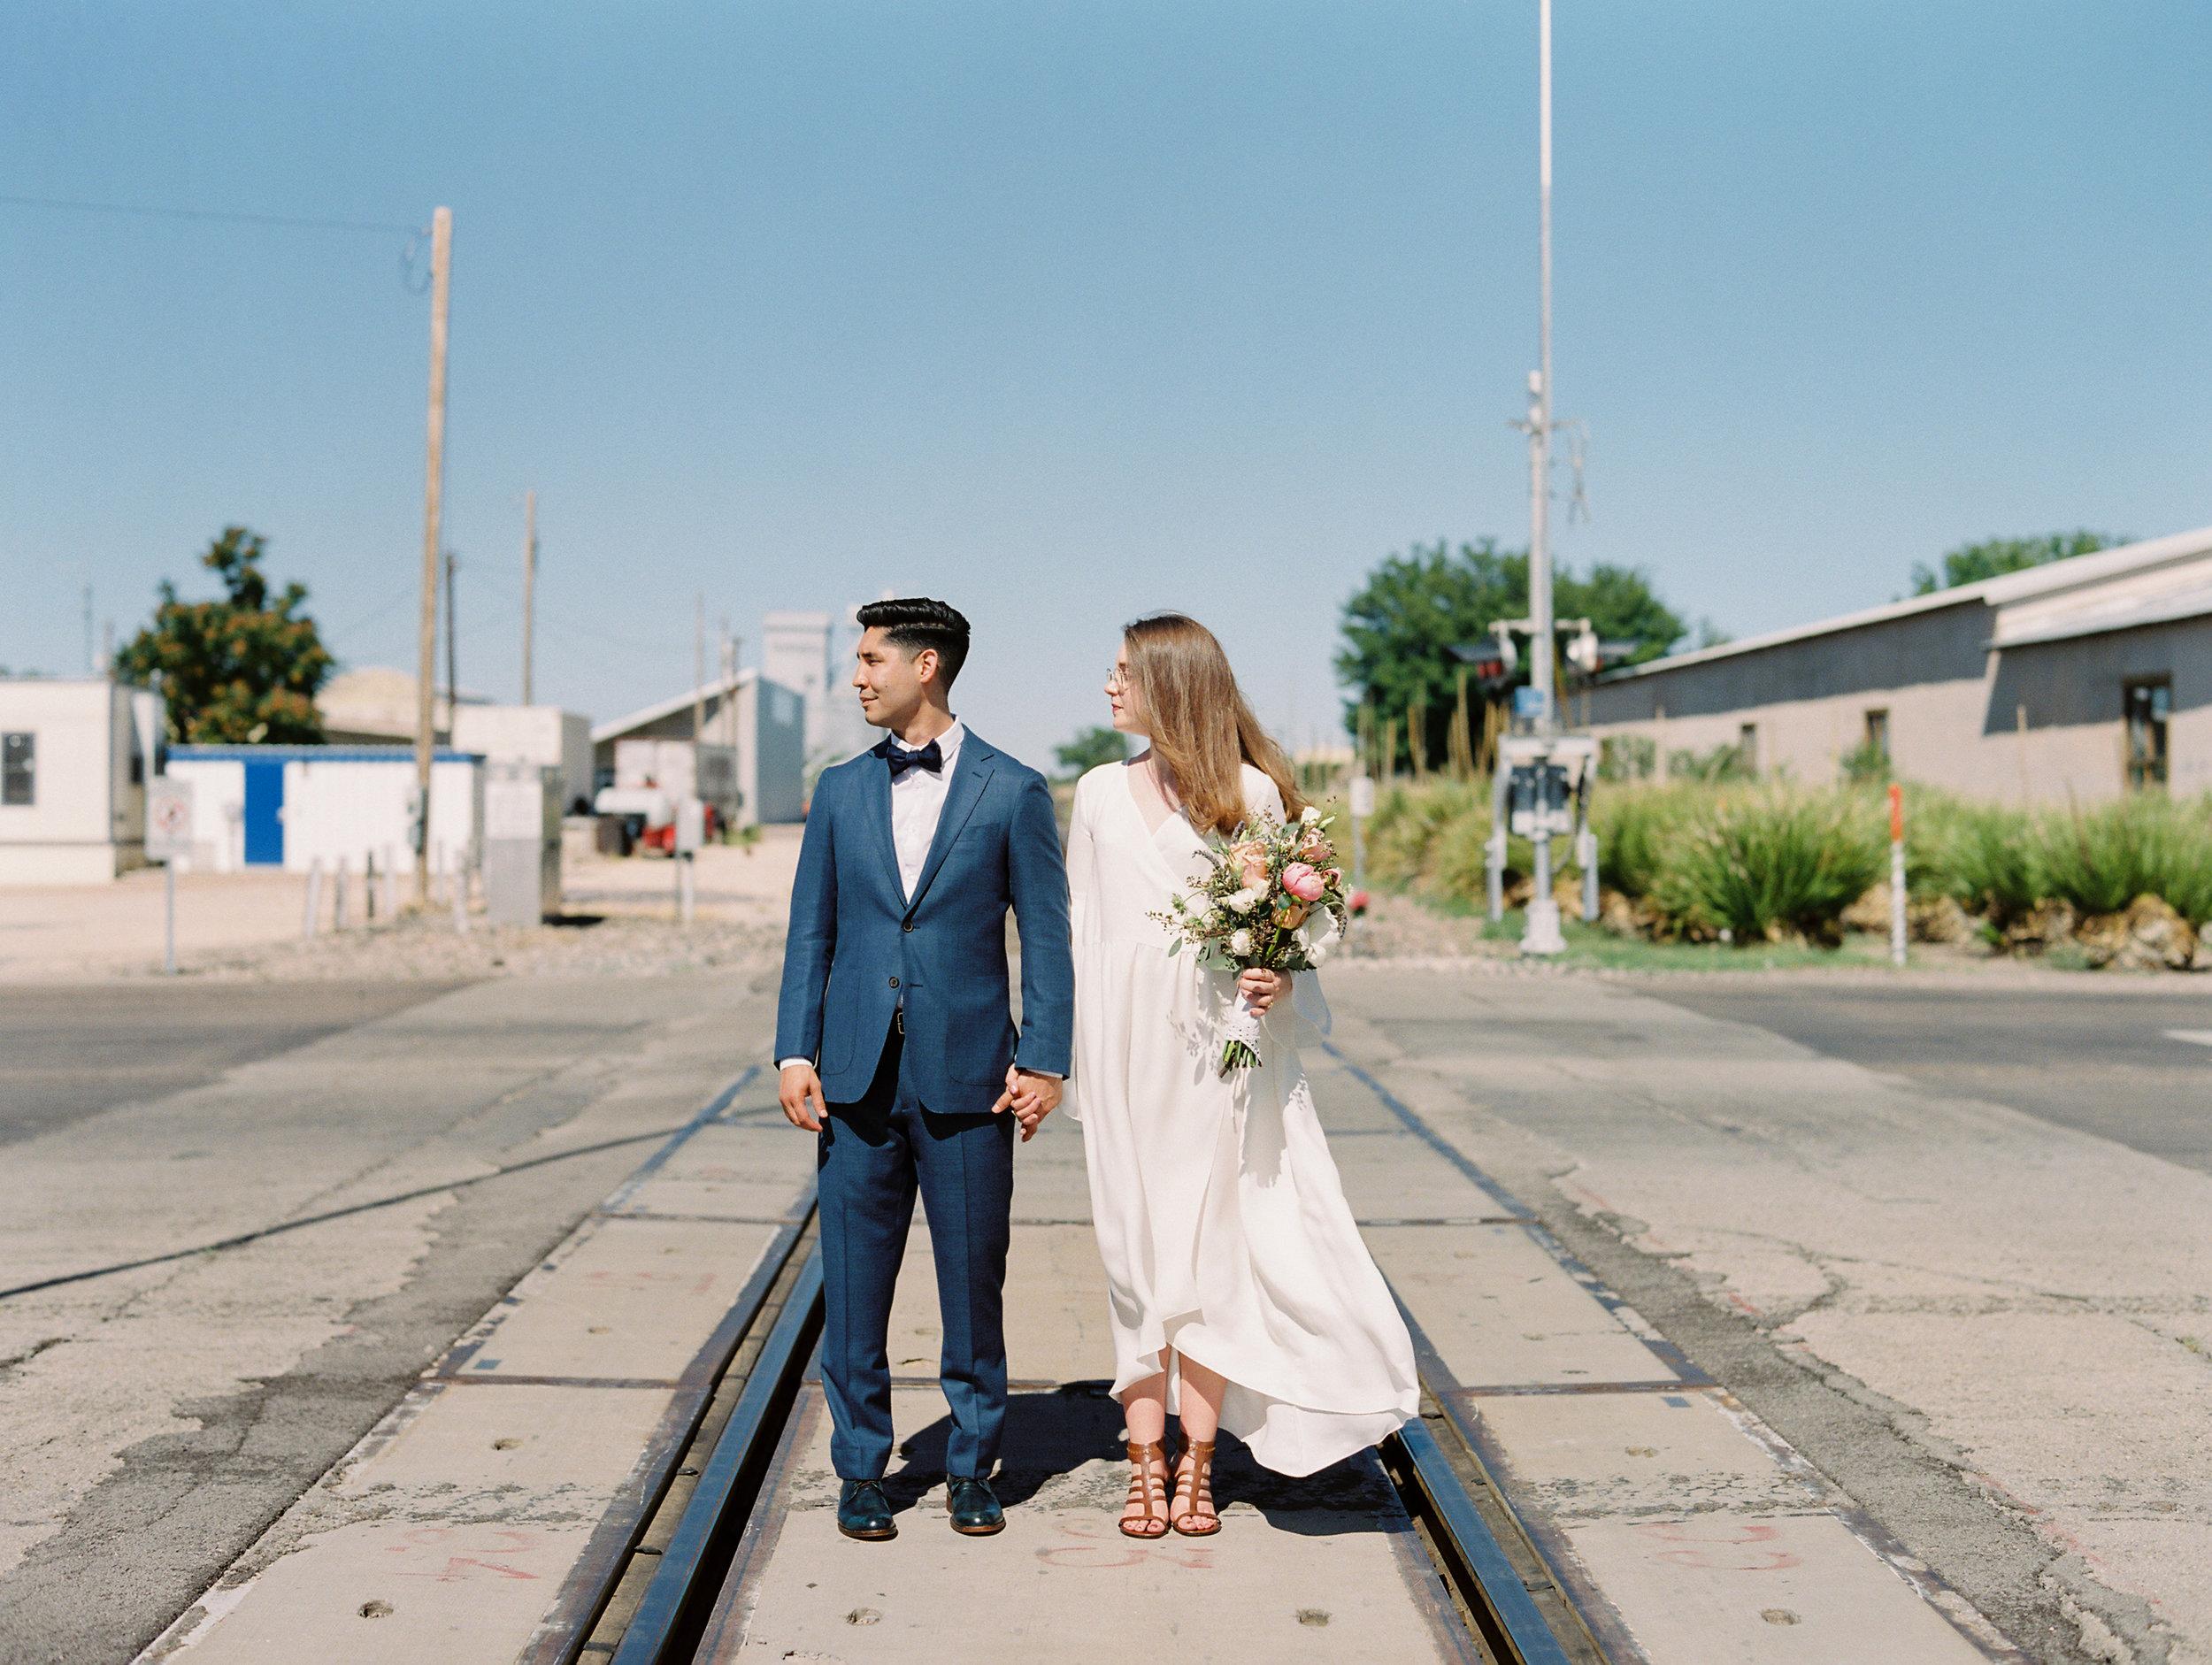 Best-Austin-Texas-Marfa-Wedding-Photographers-fine-art-film-159.jpg